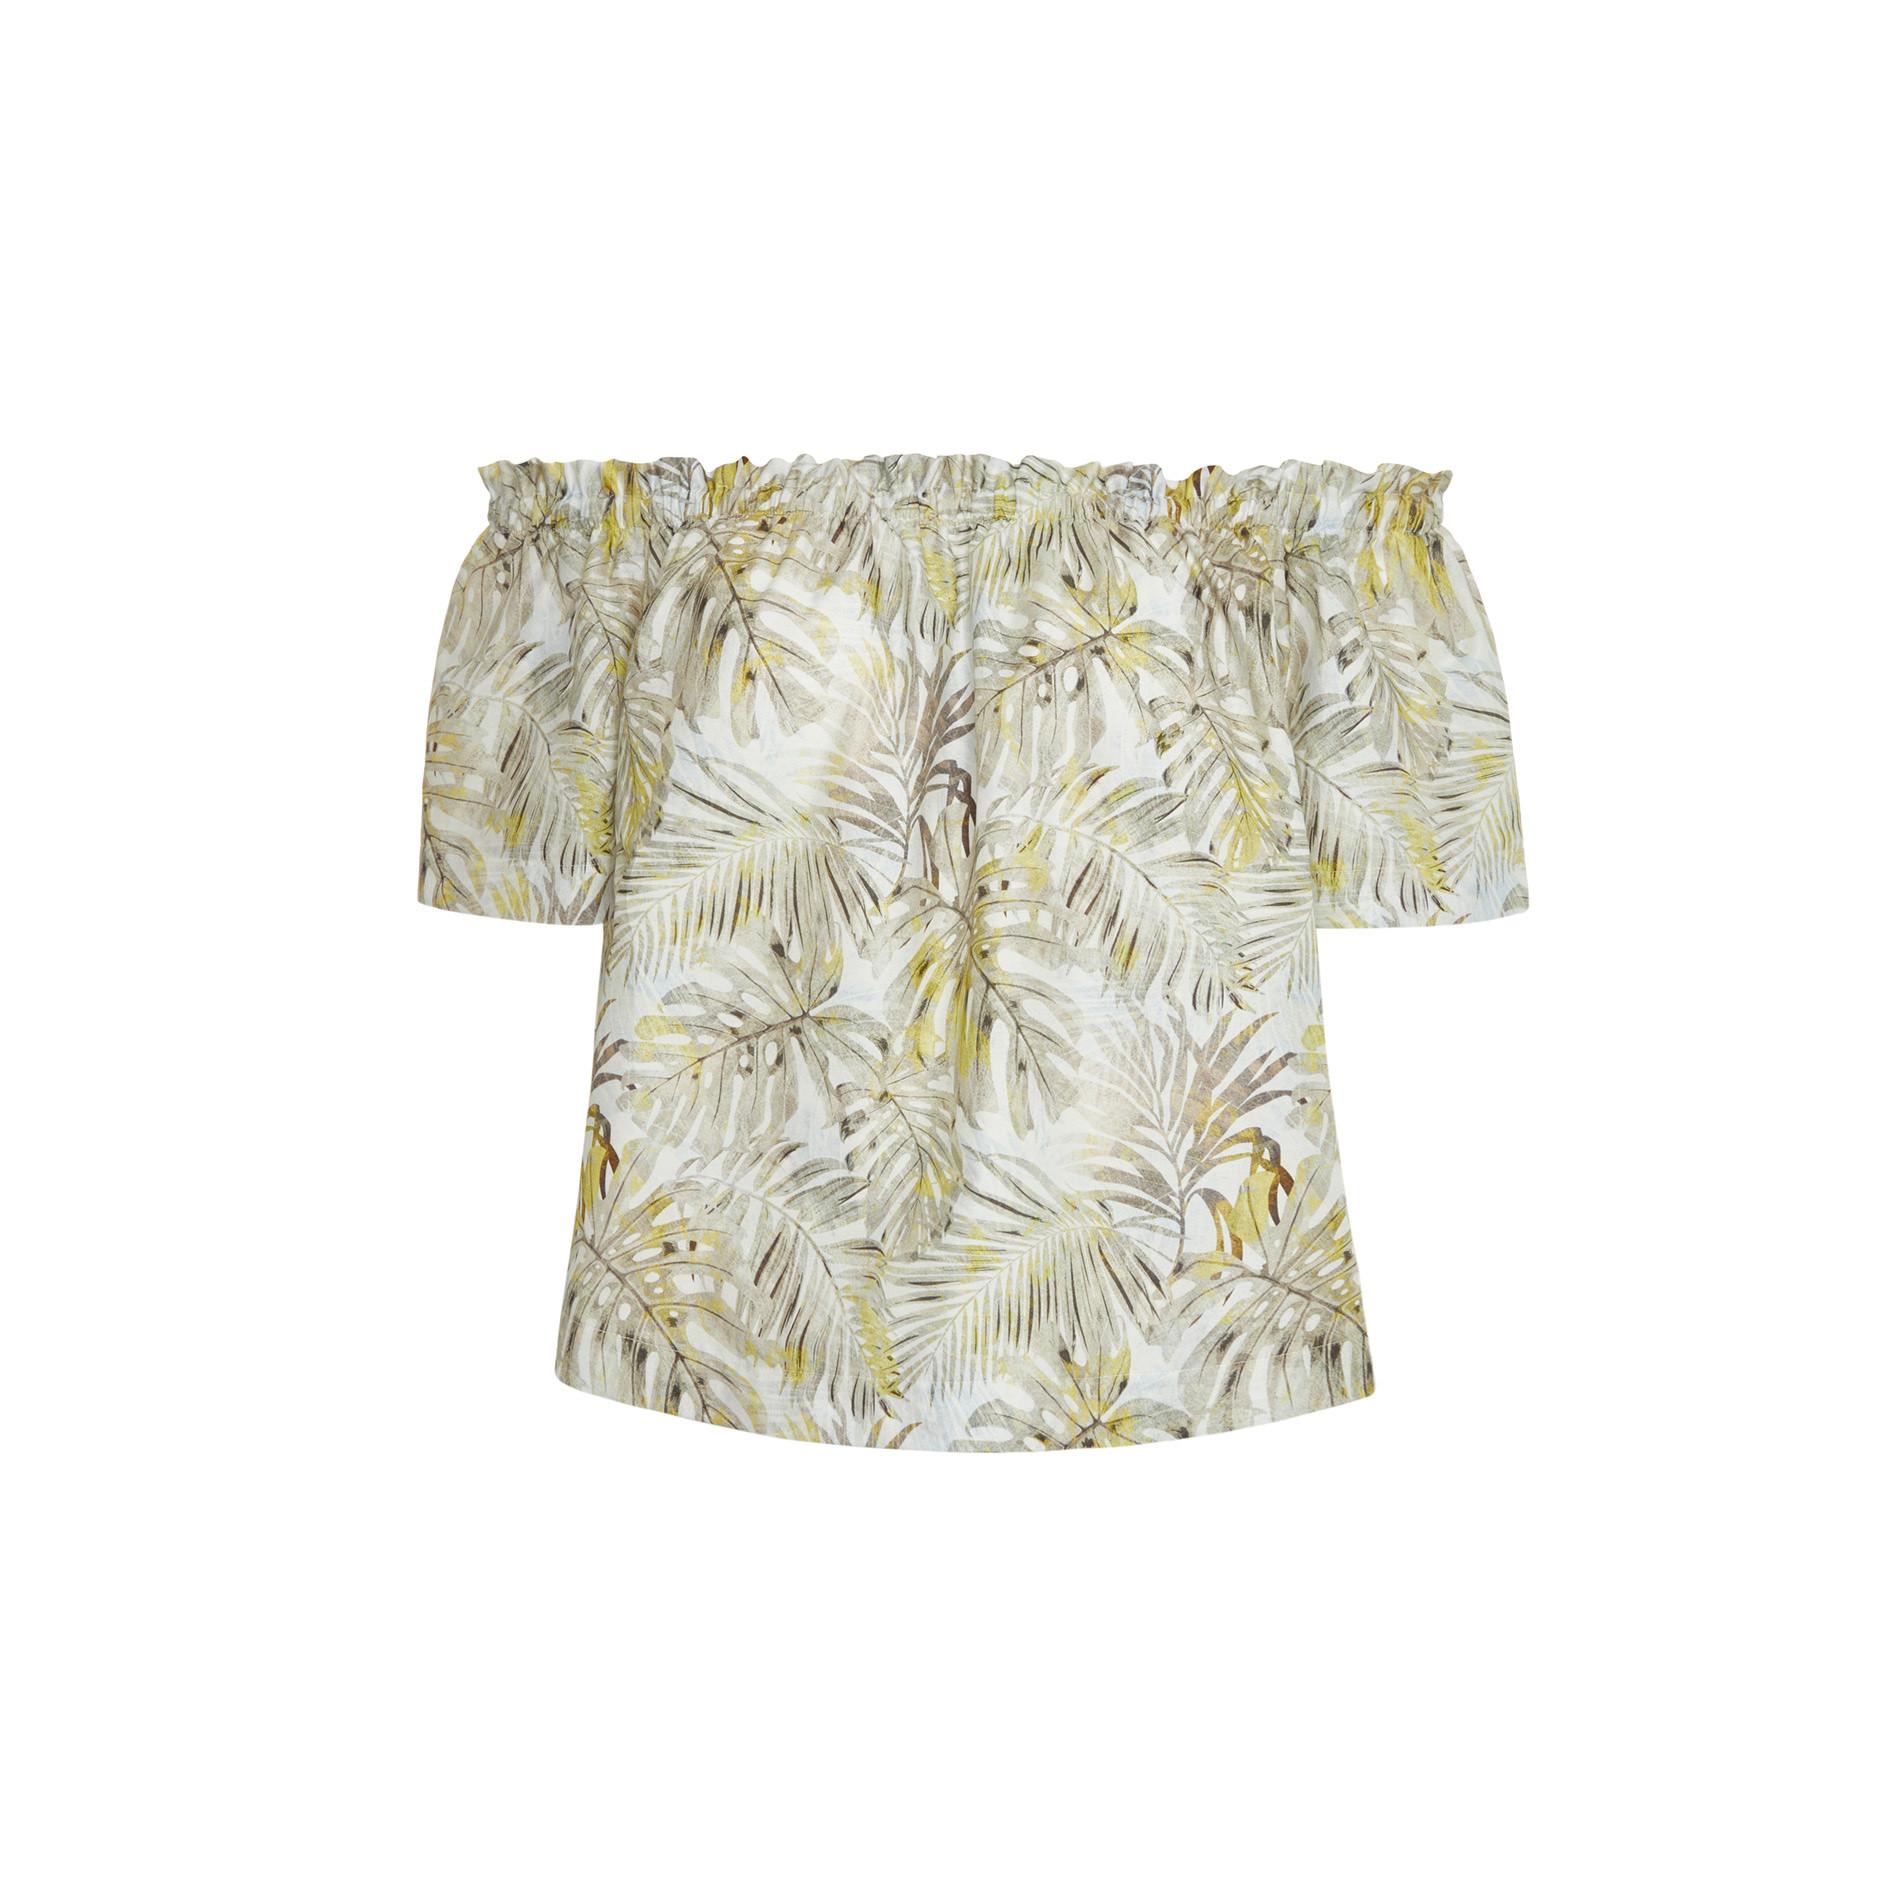 Top in puro cotone fantasia foglie, Grigio chiaro, large image number 1